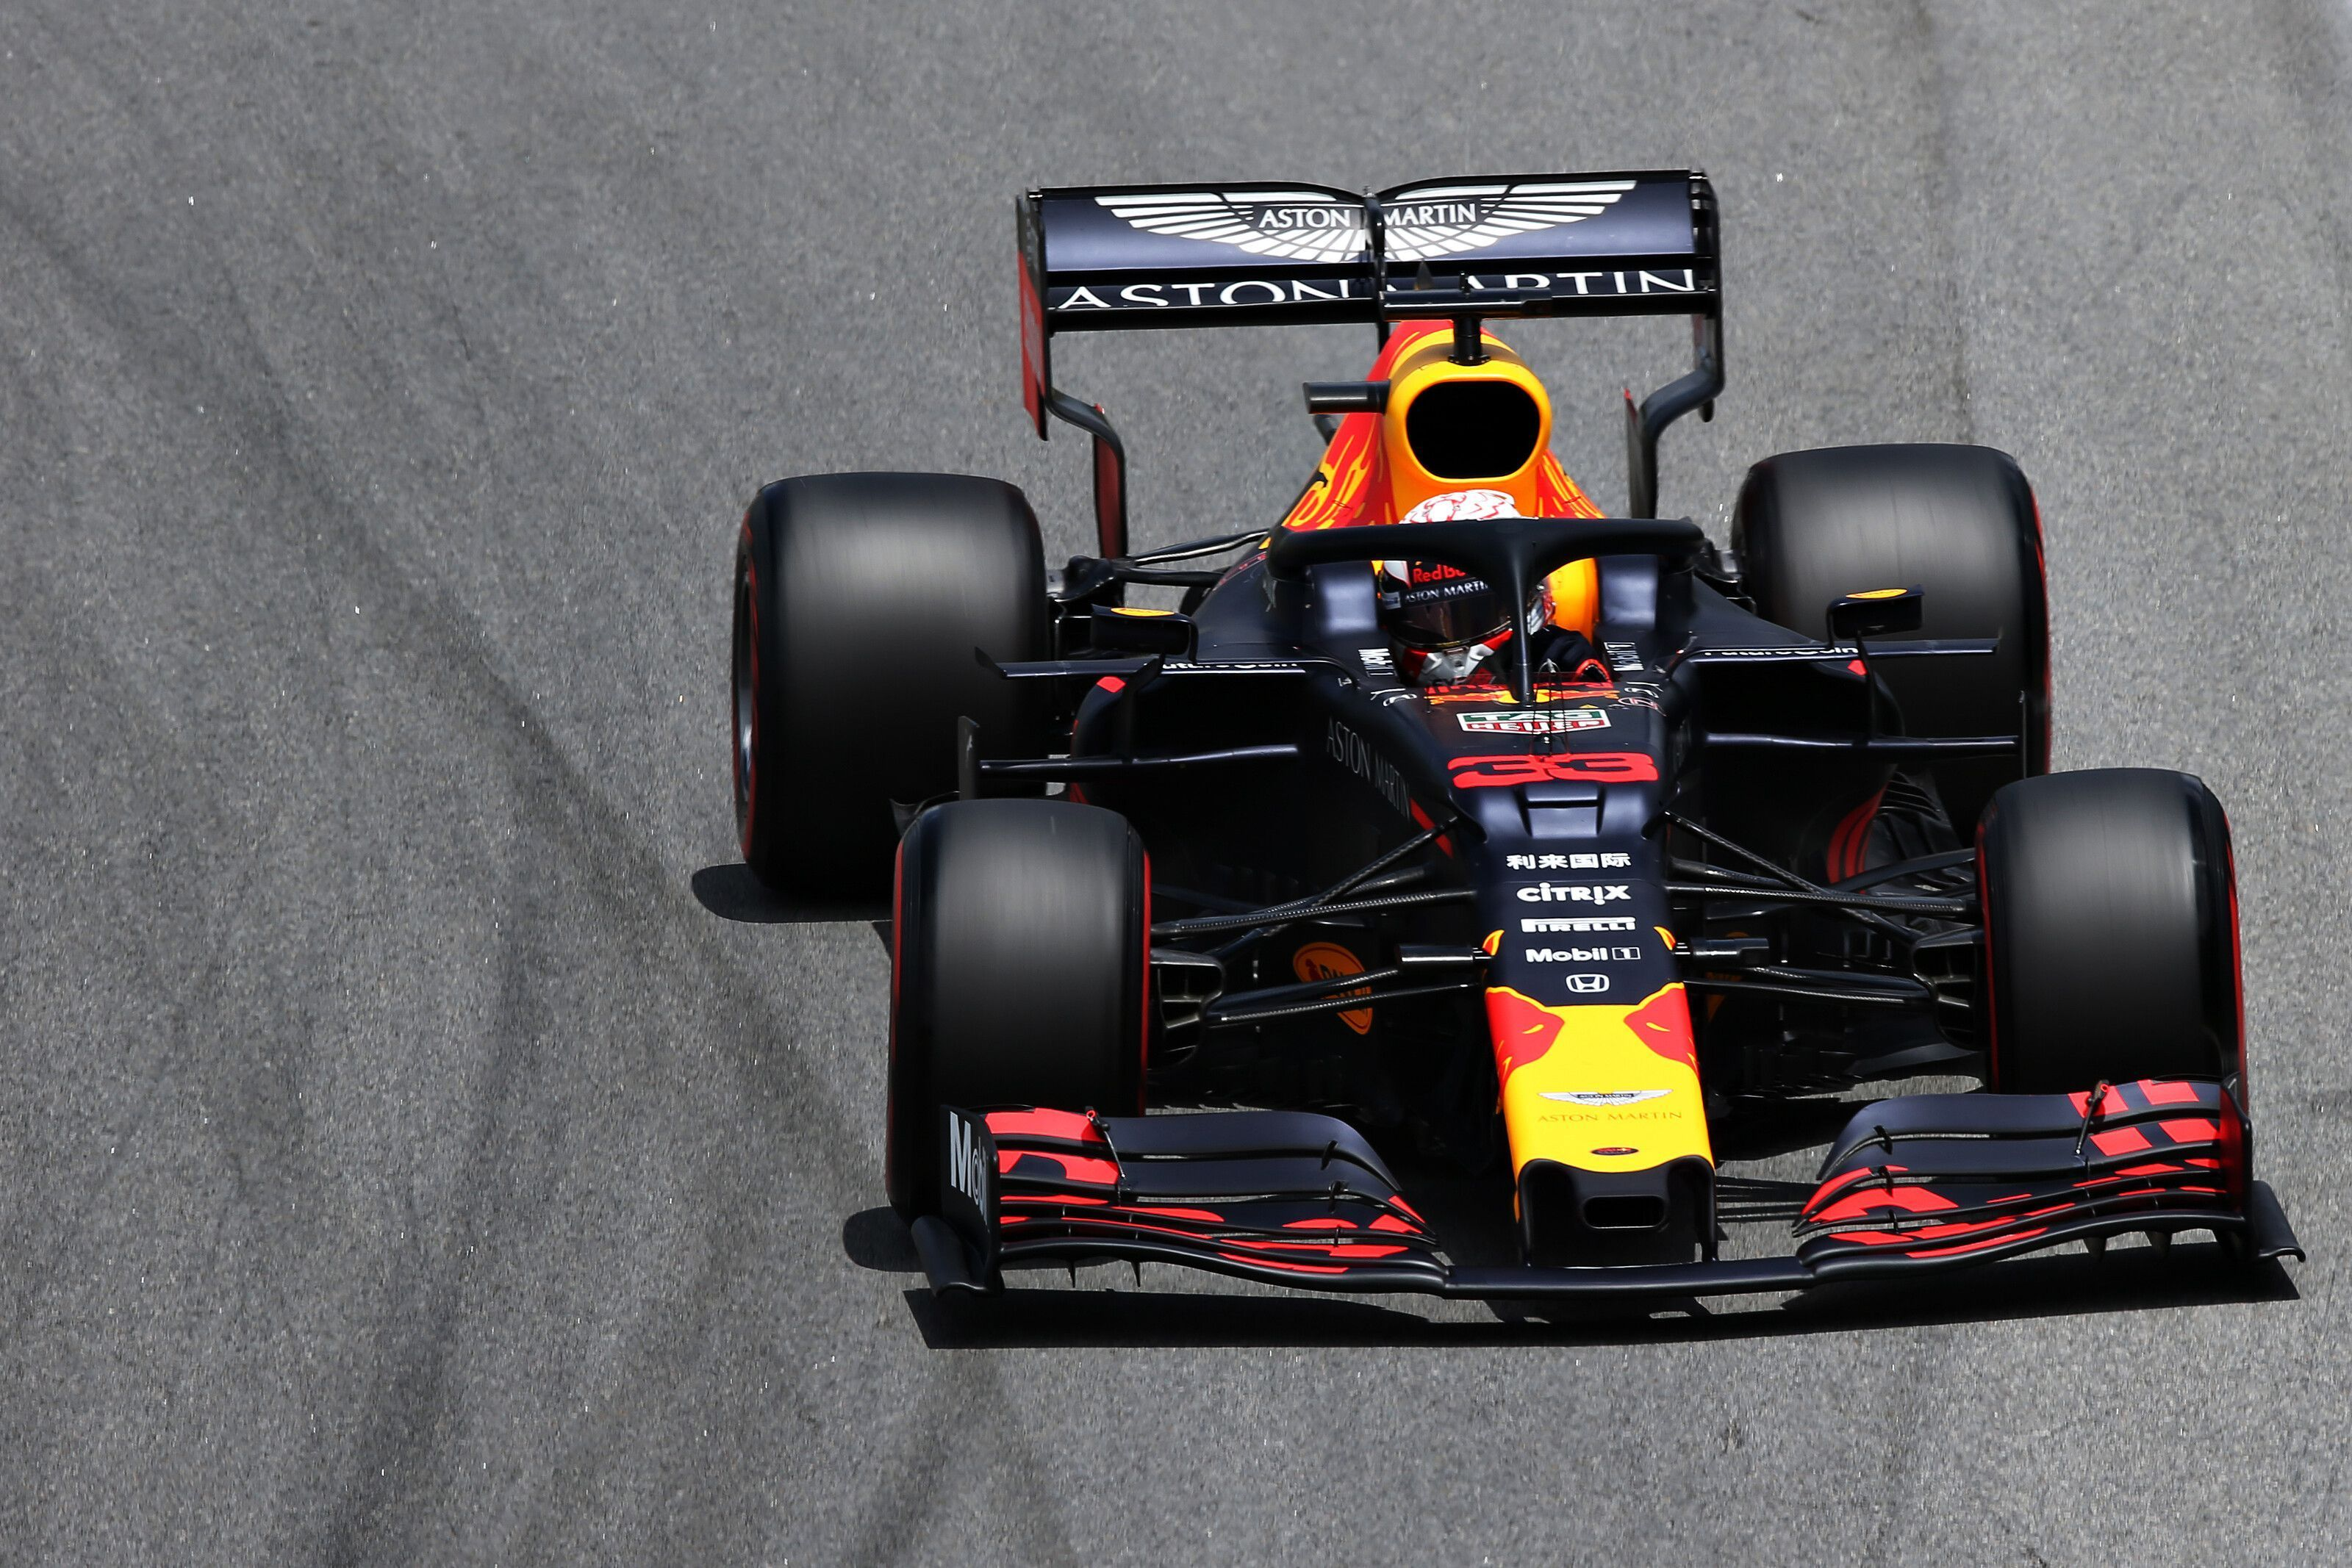 Max Verstappen, Brazil GP